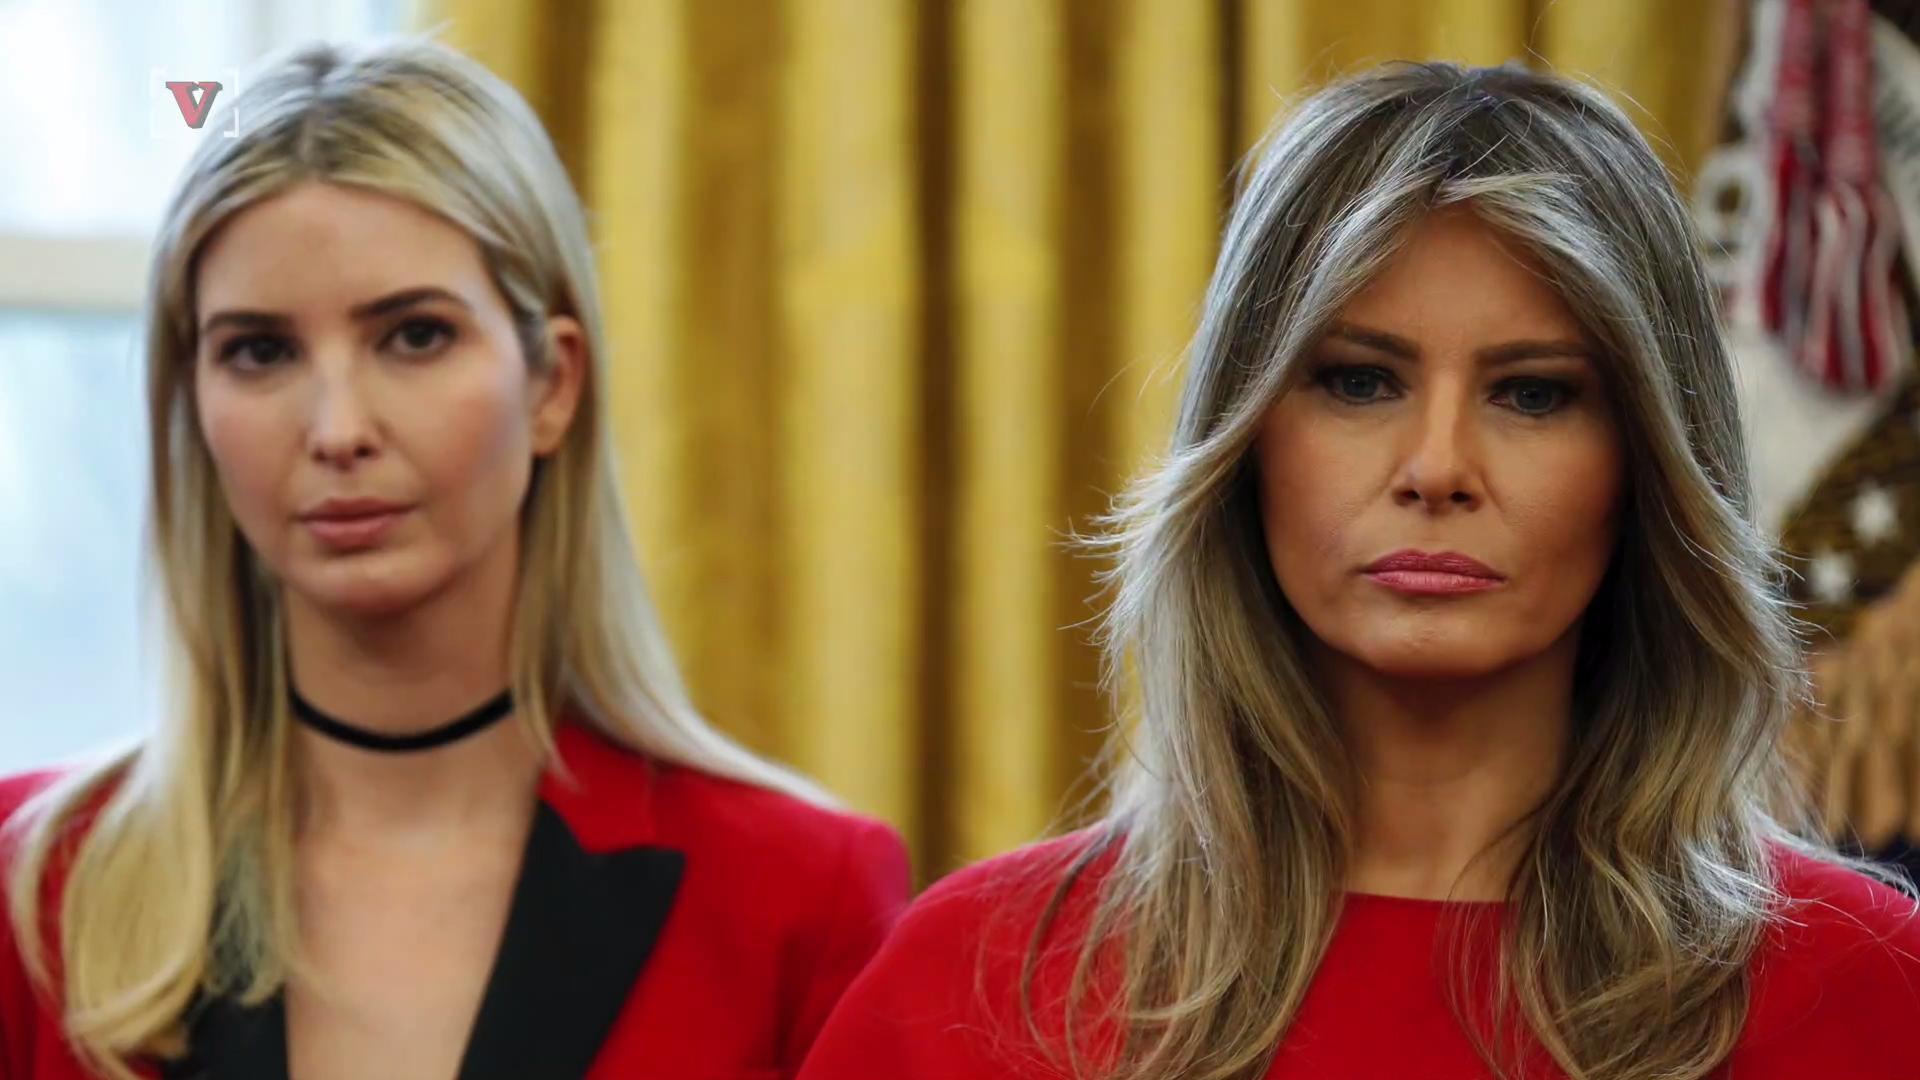 Do Melania and Ivanka Trump Dislike Each Other?